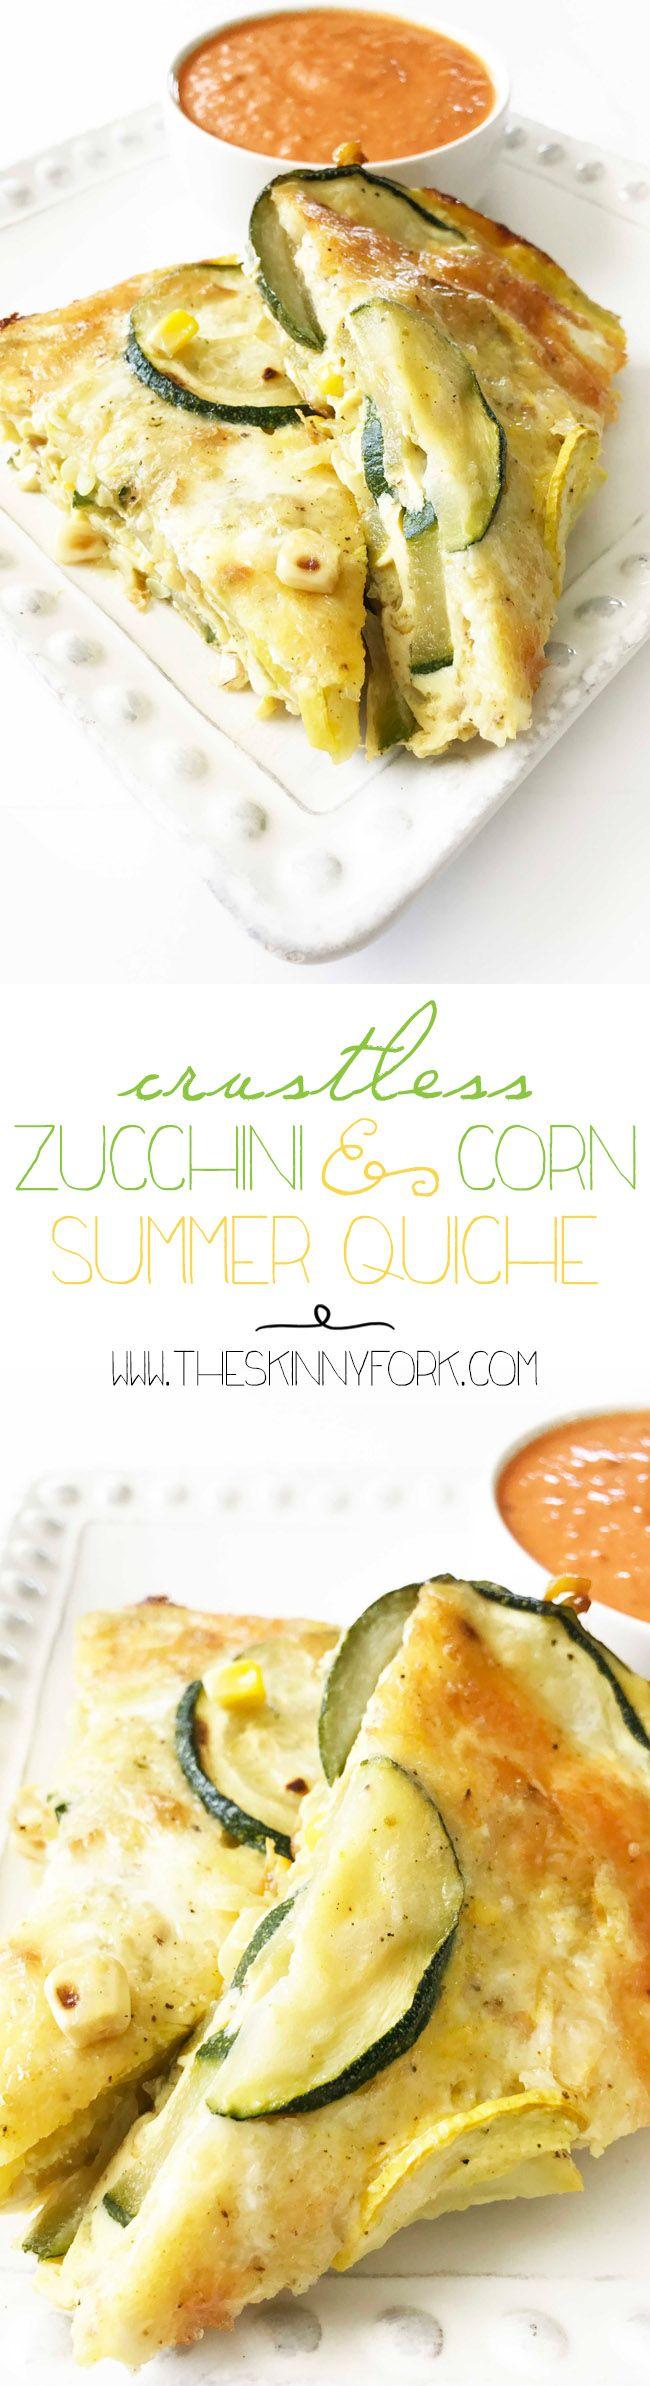 Best 25+ Zucchini quiche recipes ideas on Pinterest ...